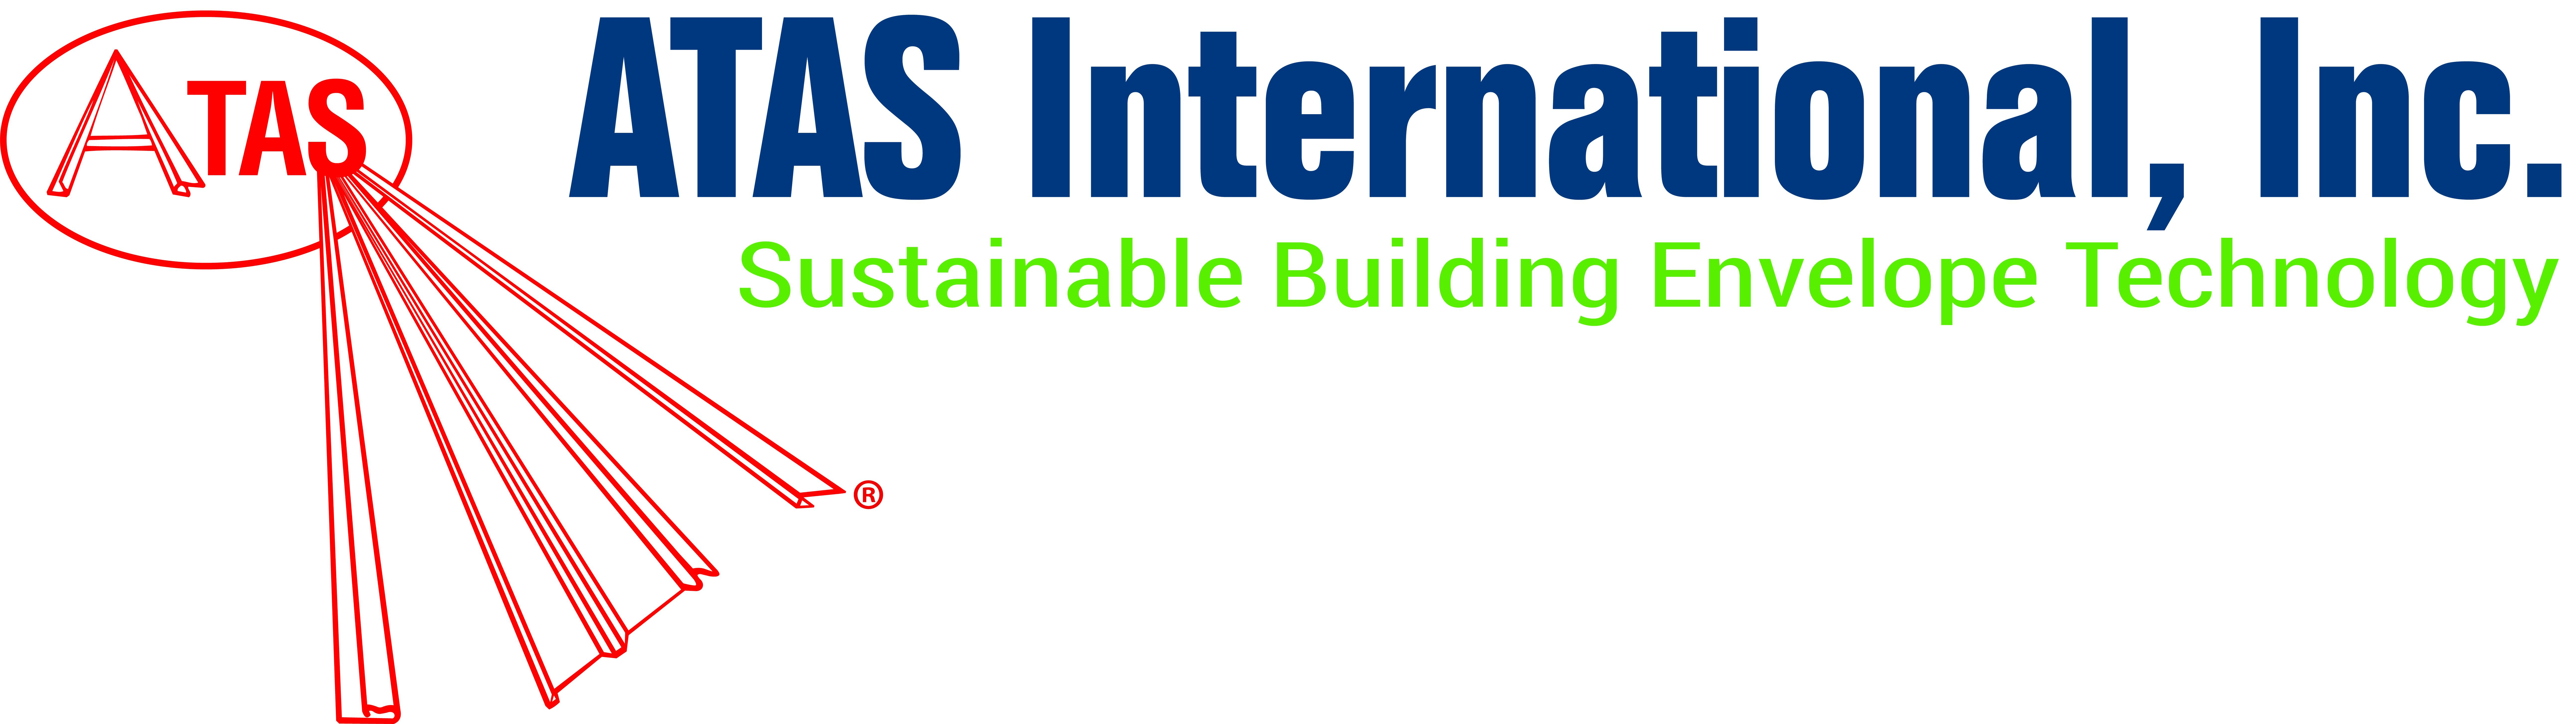 ATAS International, Inc.